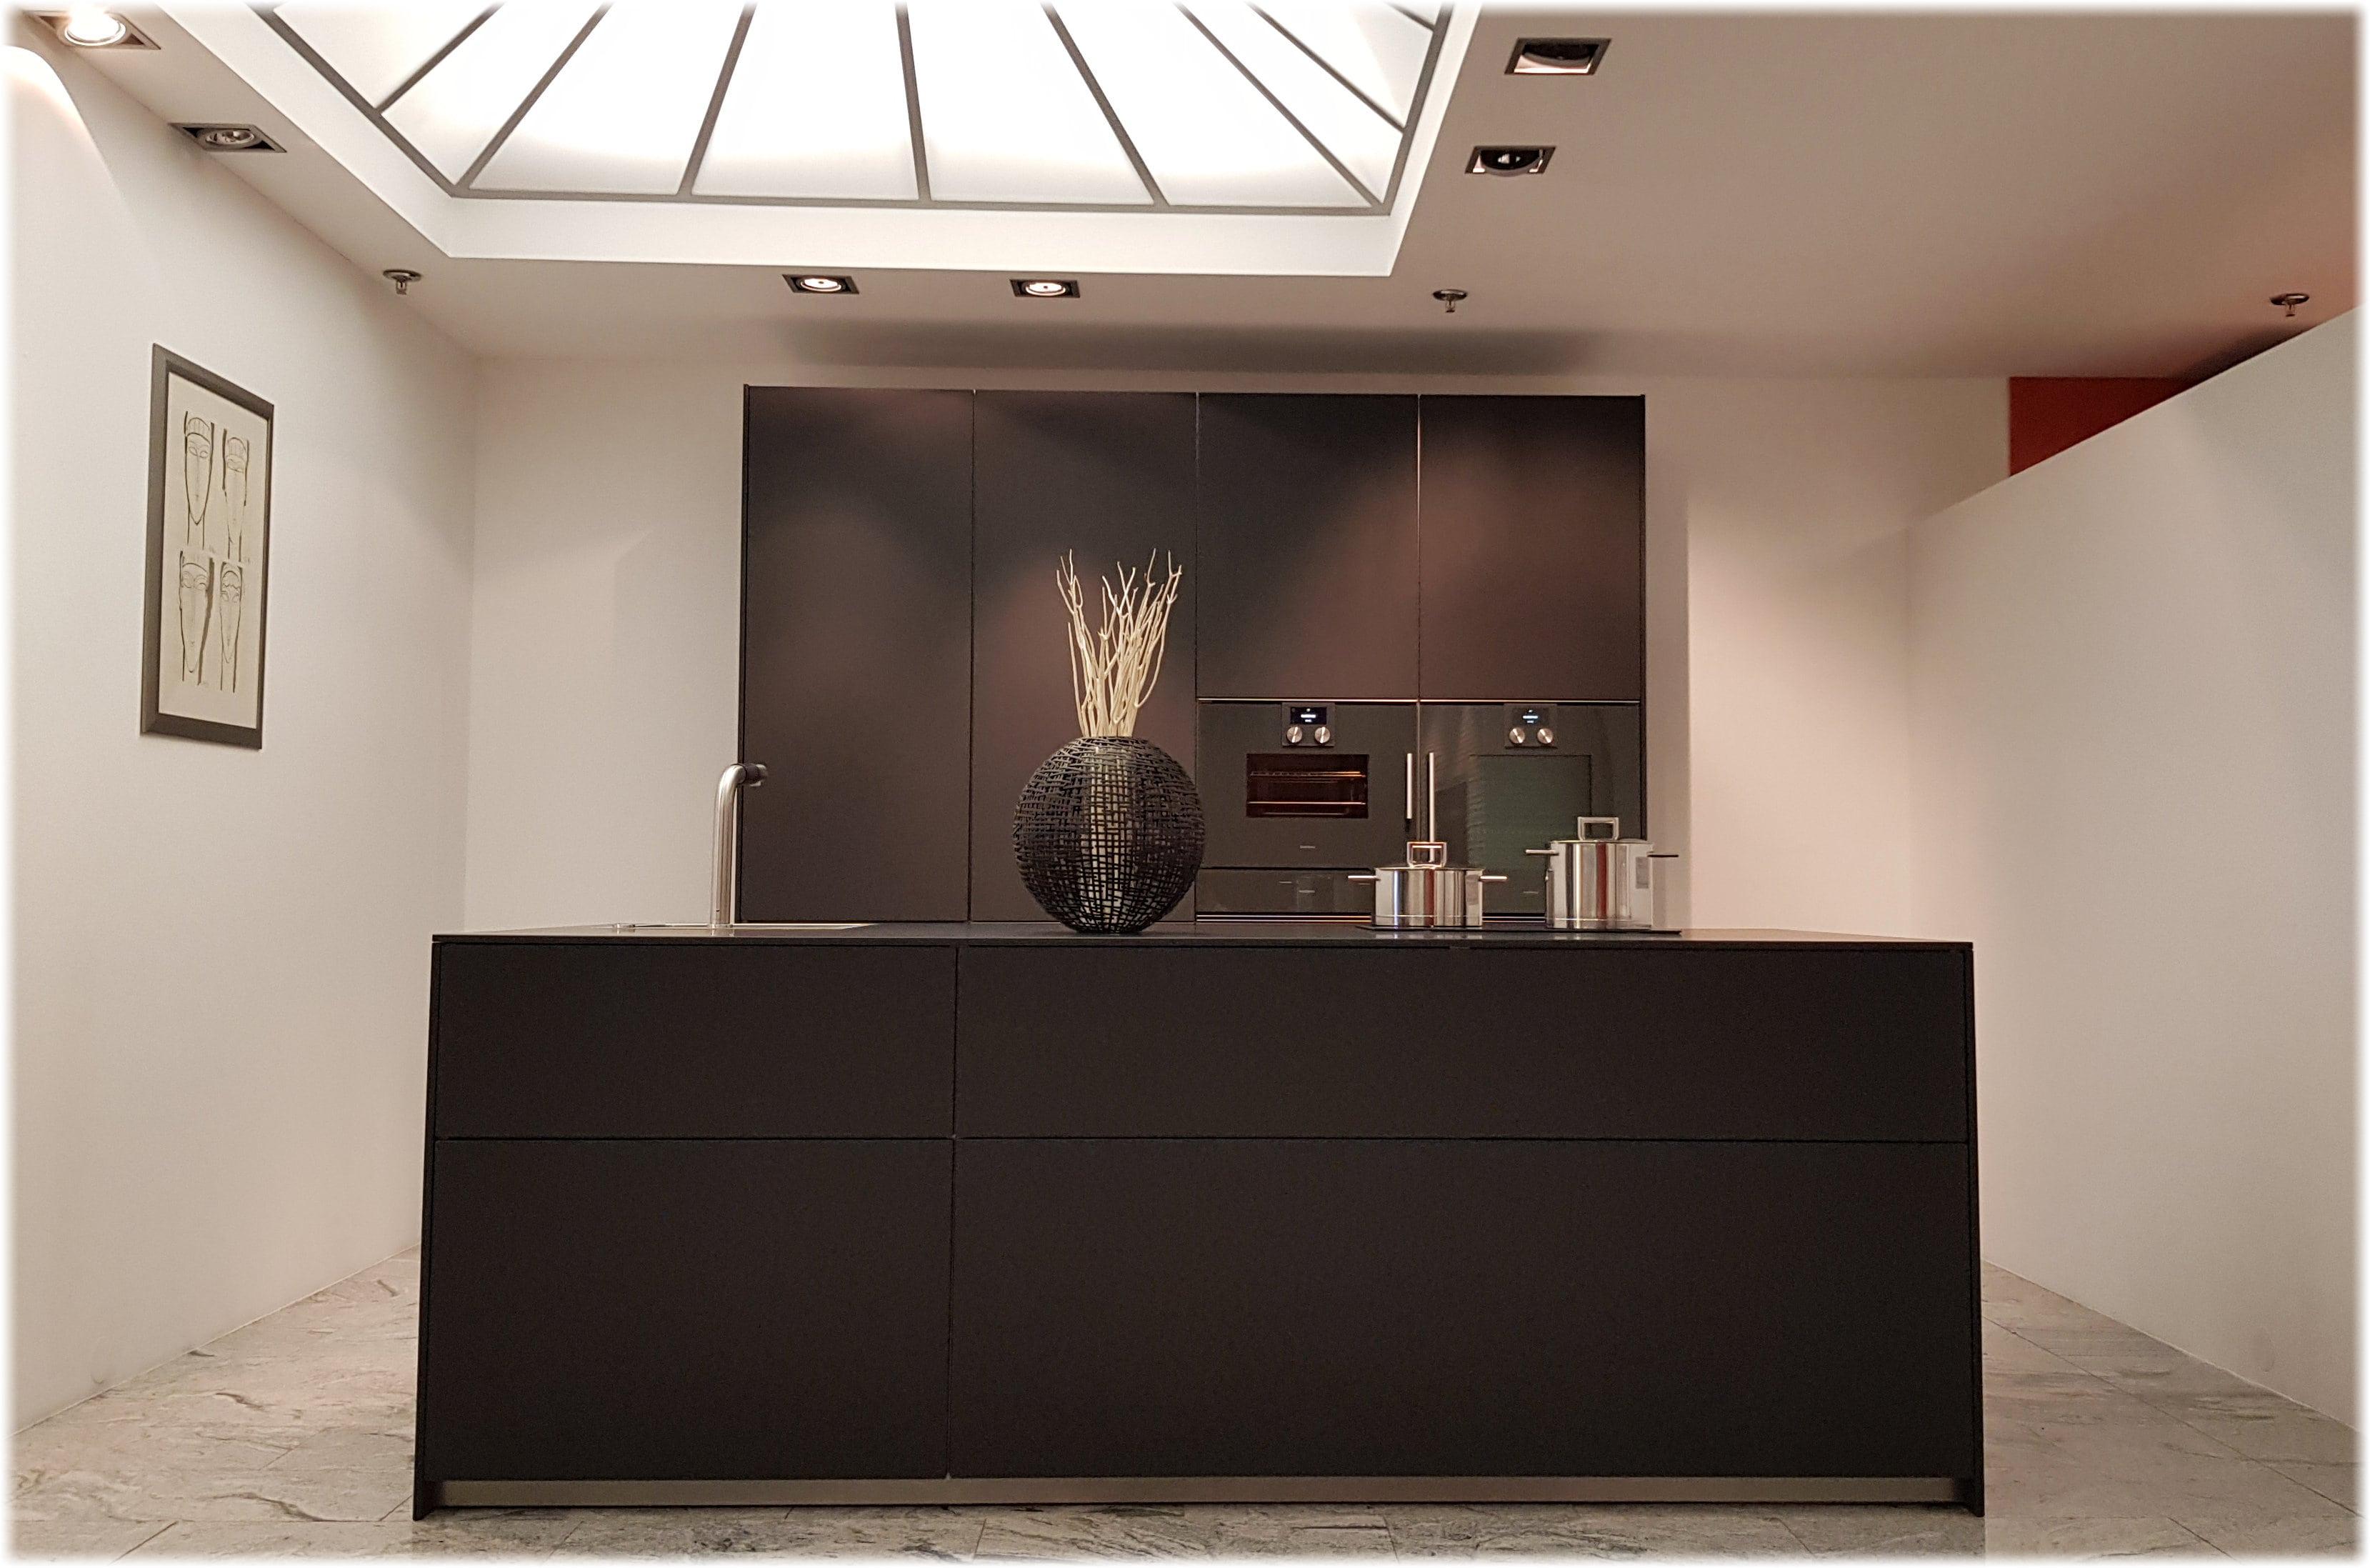 profil einrichtungen exklusive m bel in esslingen. Black Bedroom Furniture Sets. Home Design Ideas